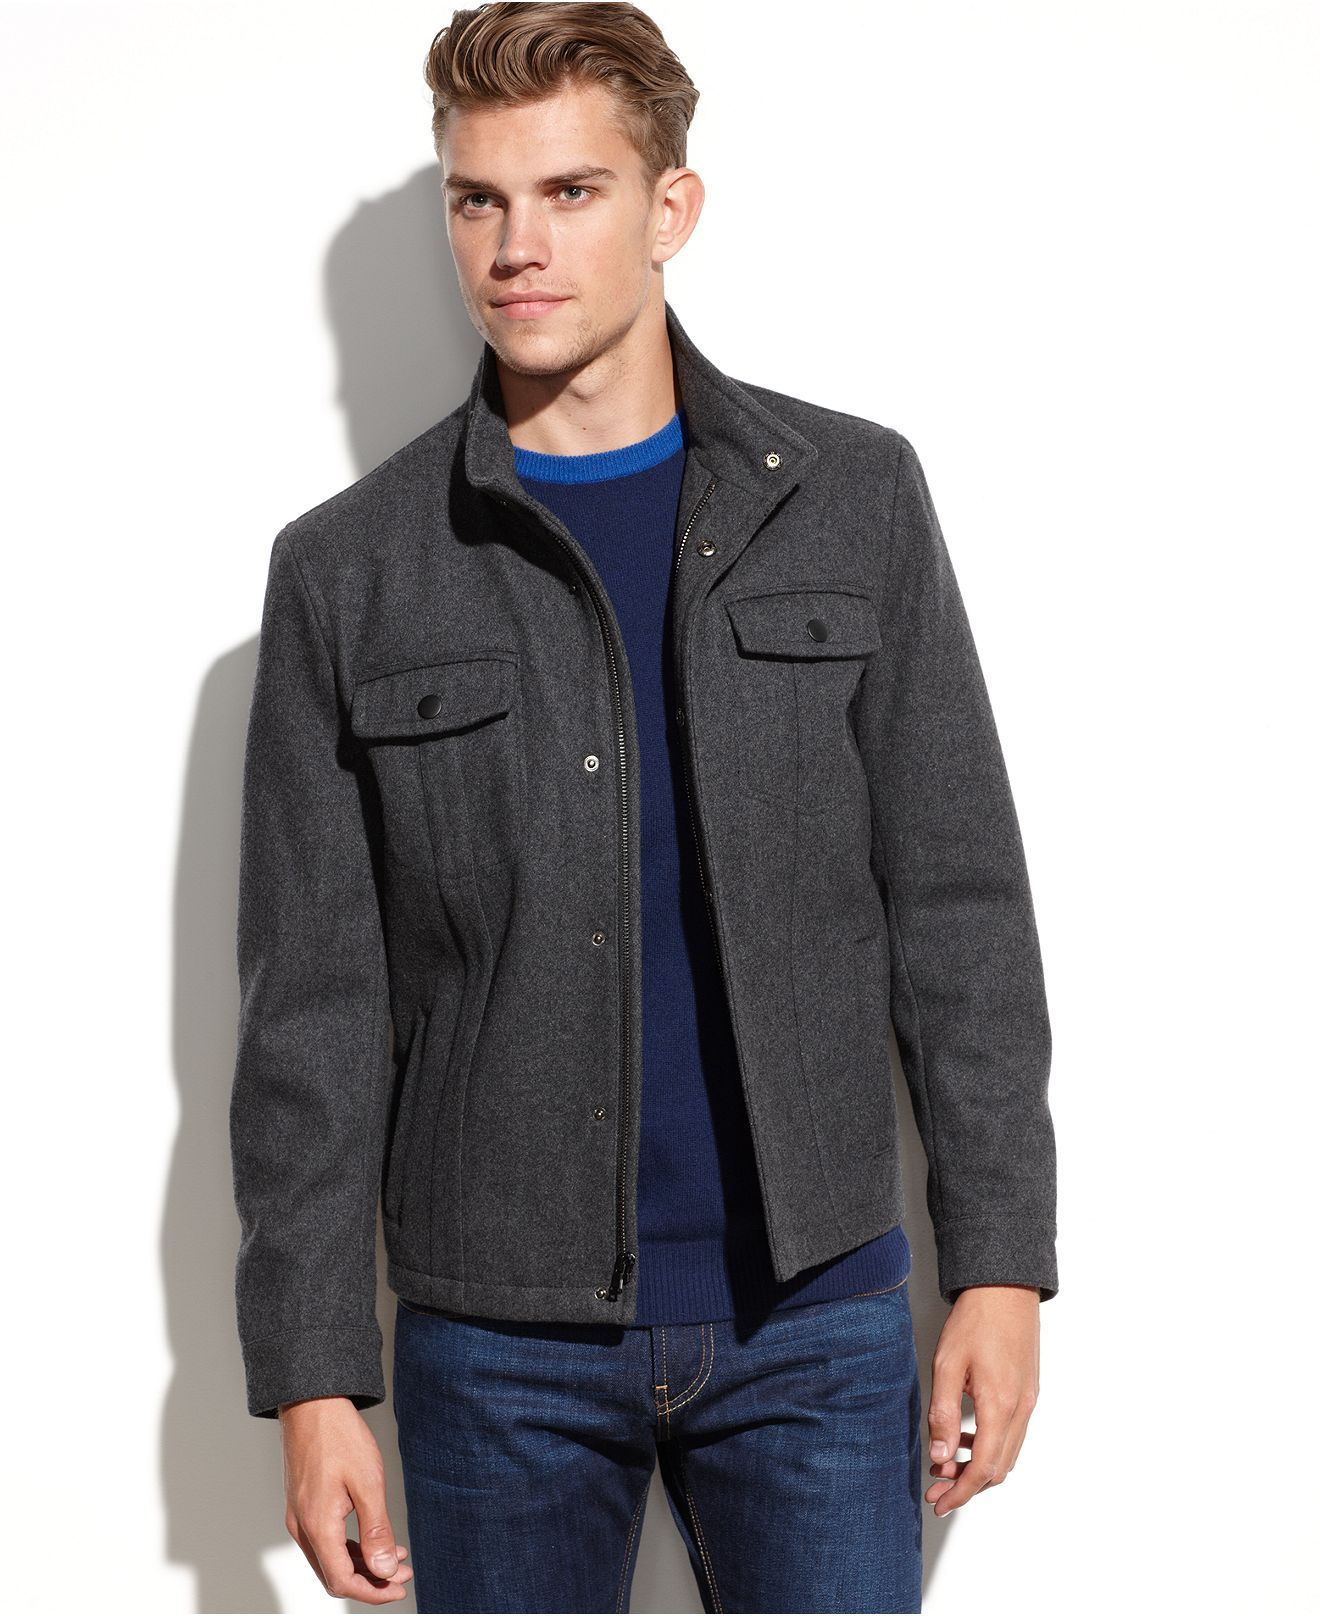 Kenneth Cole Reaction Jacket Wool Blend Short Coat Coats Jackets Men Macy S Men Outerwear Casual Short Coat Mens Jackets [ 1616 x 1320 Pixel ]